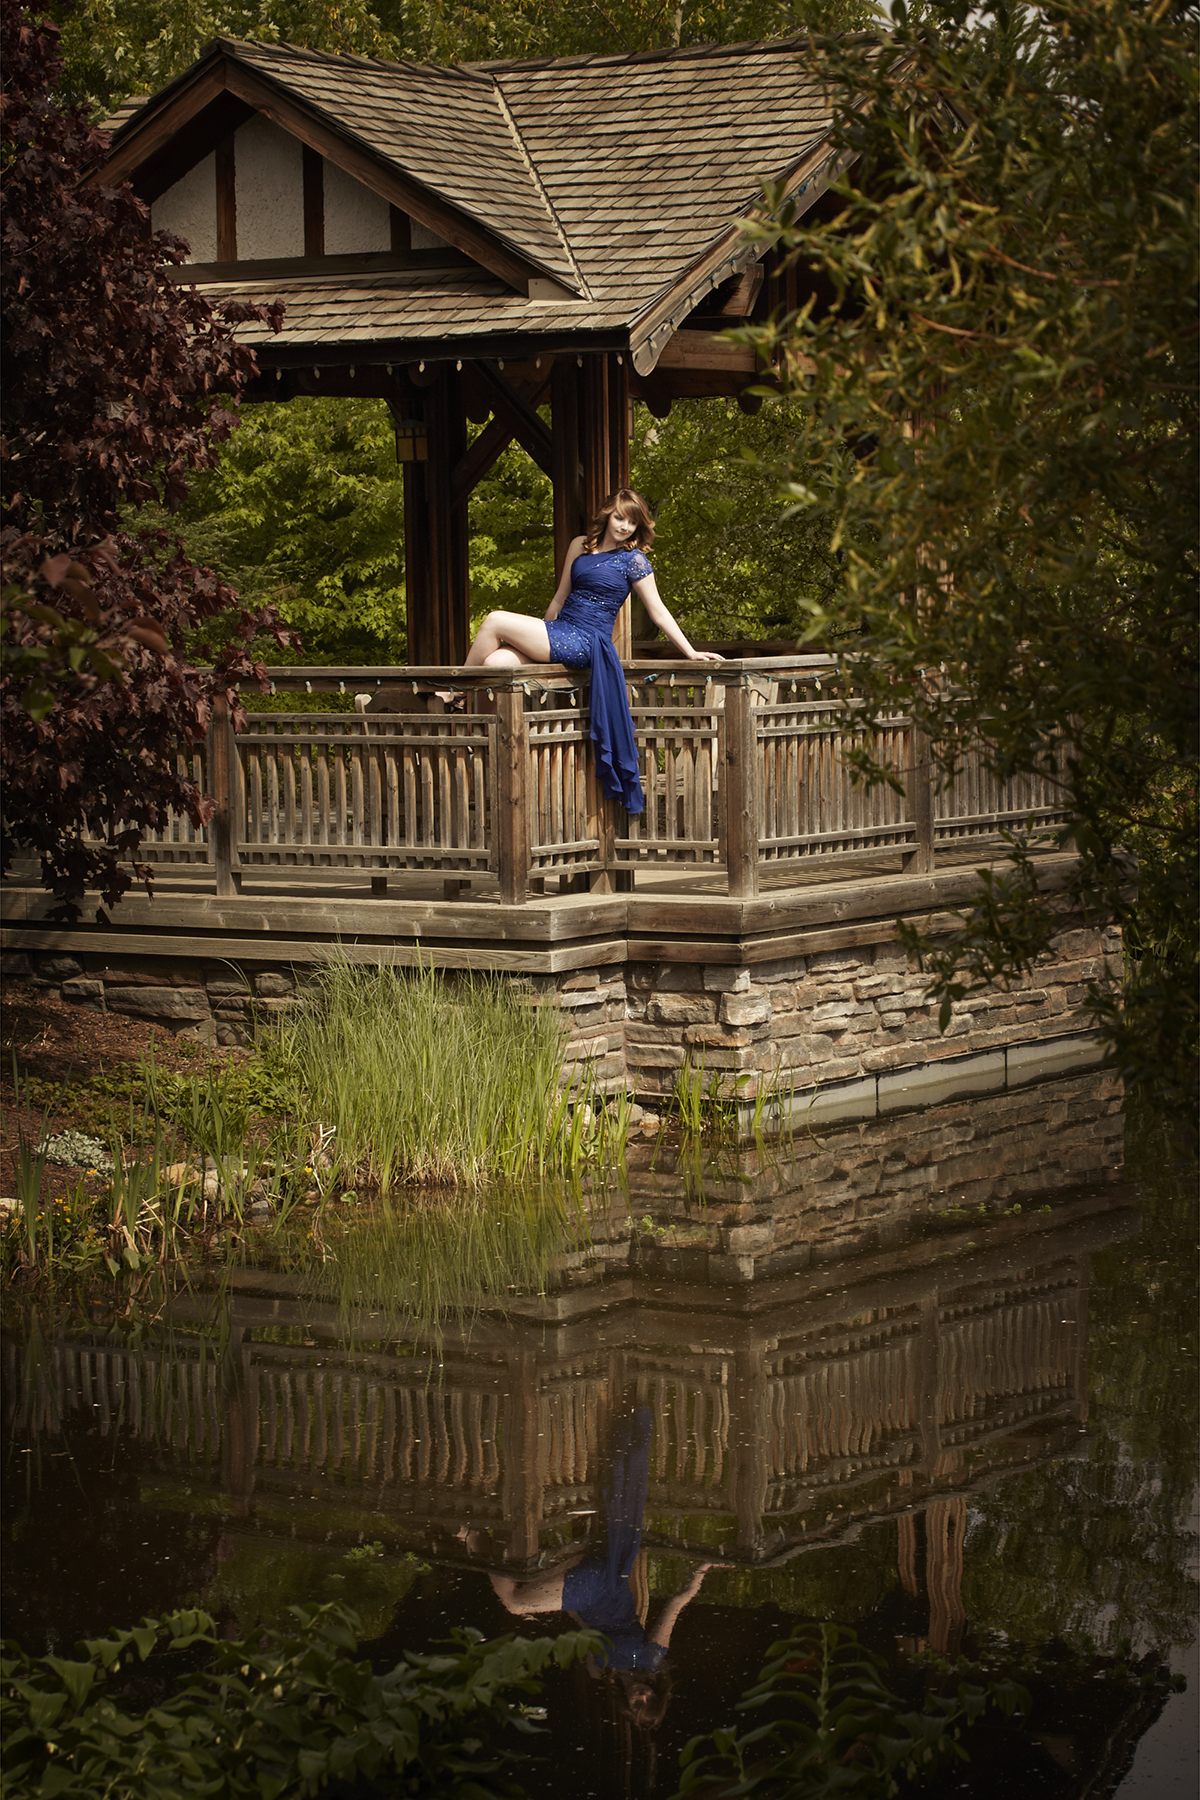 professional-grad-photographer-saskatoon-cindy-moleski-27460-Rempel-2049.jpg